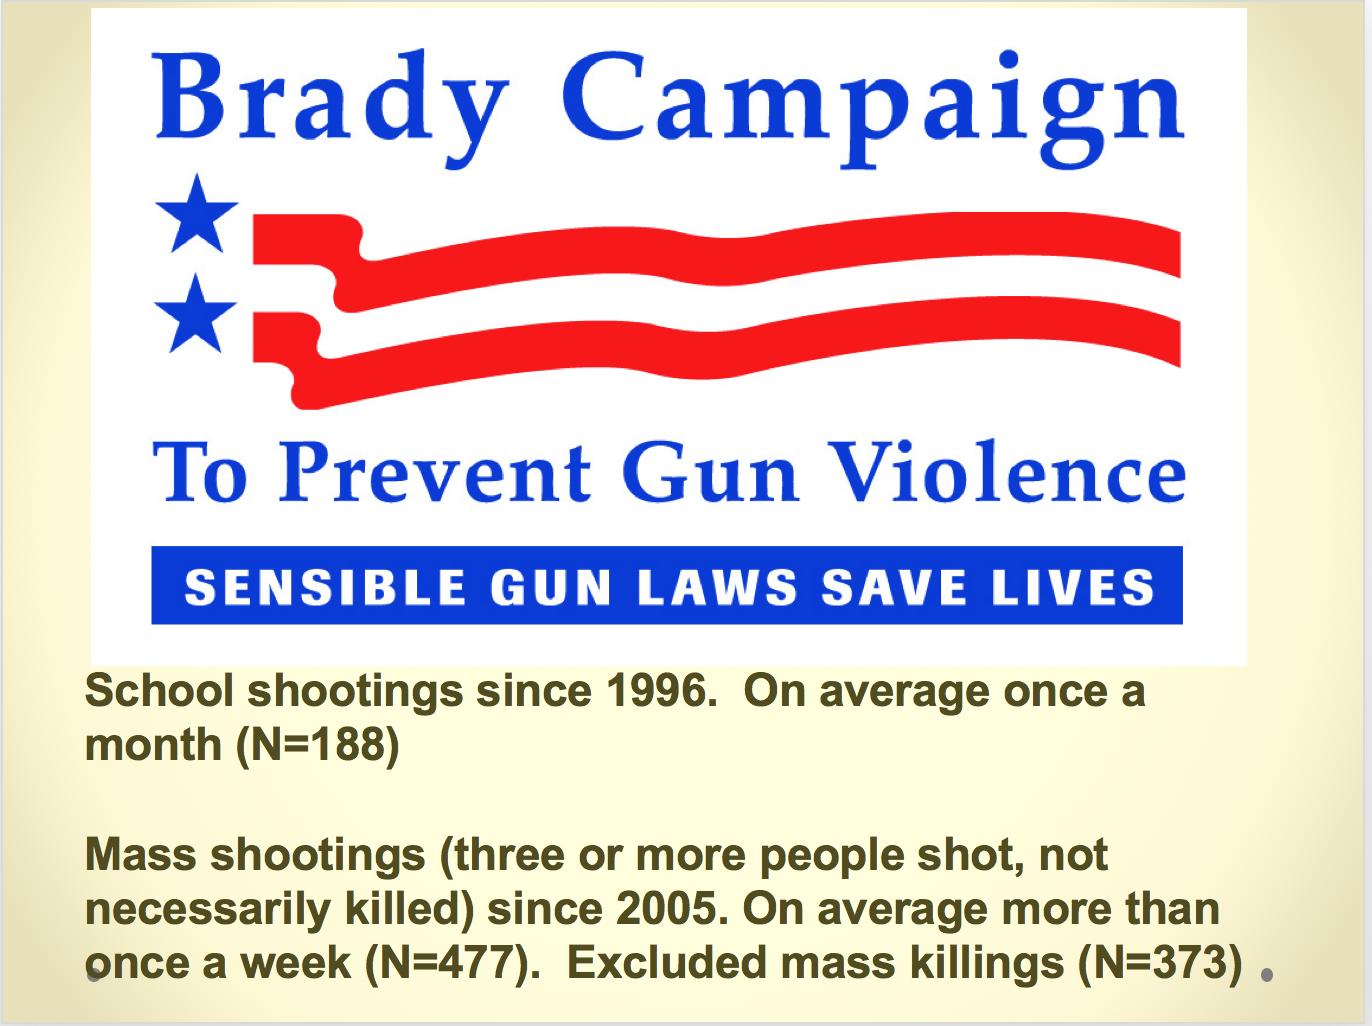 plos_mass_killing_brady_campaign_data